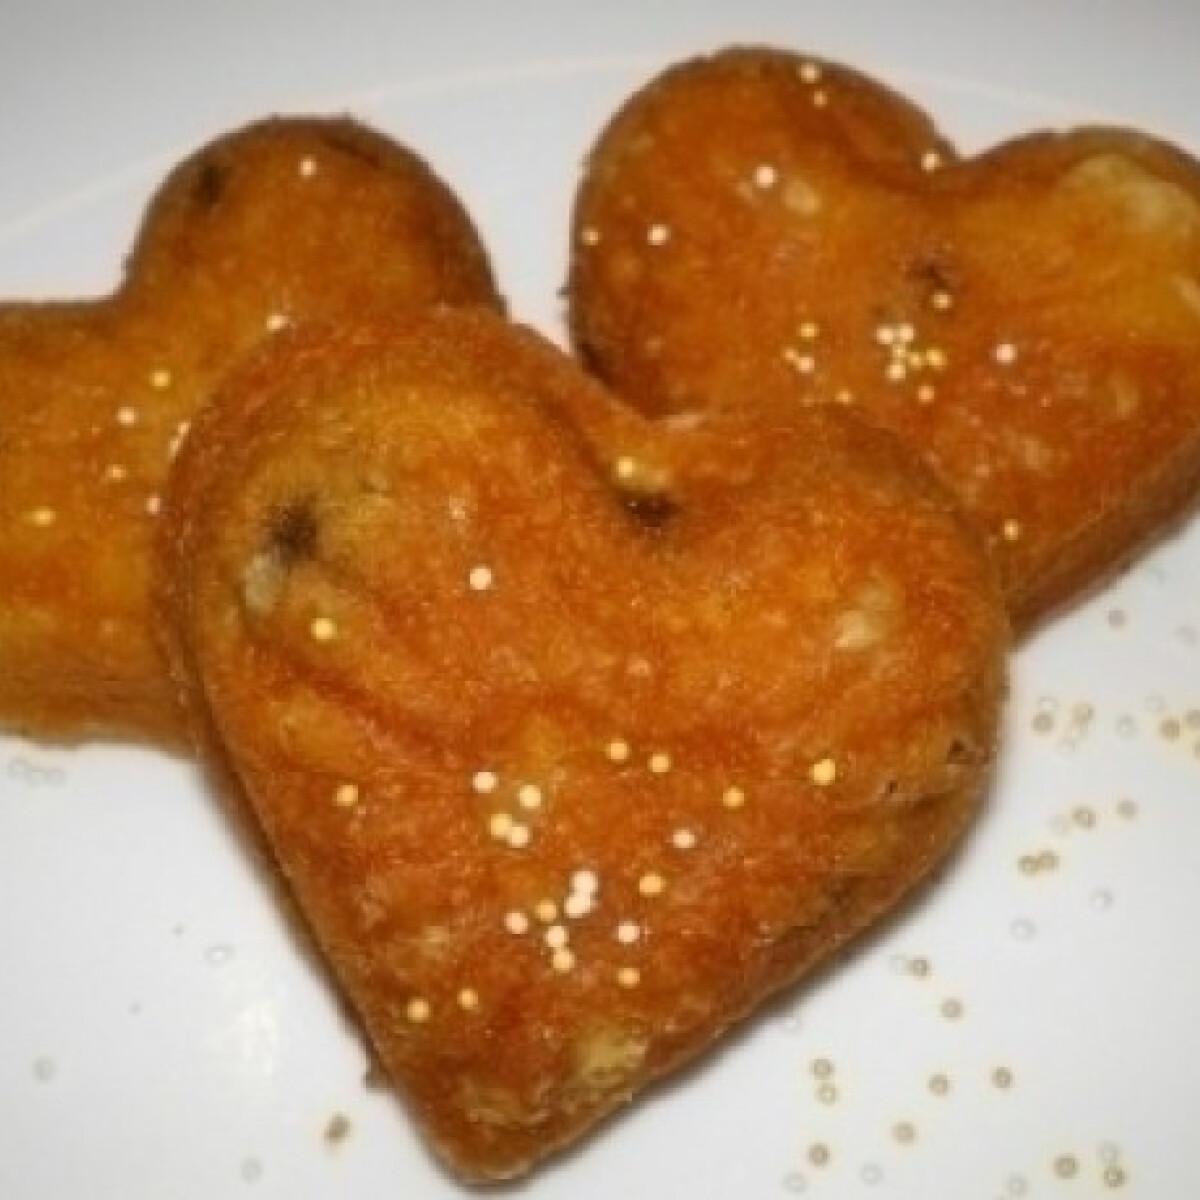 Valentin napi muffin (Legegyszerűbb muffin 3.)